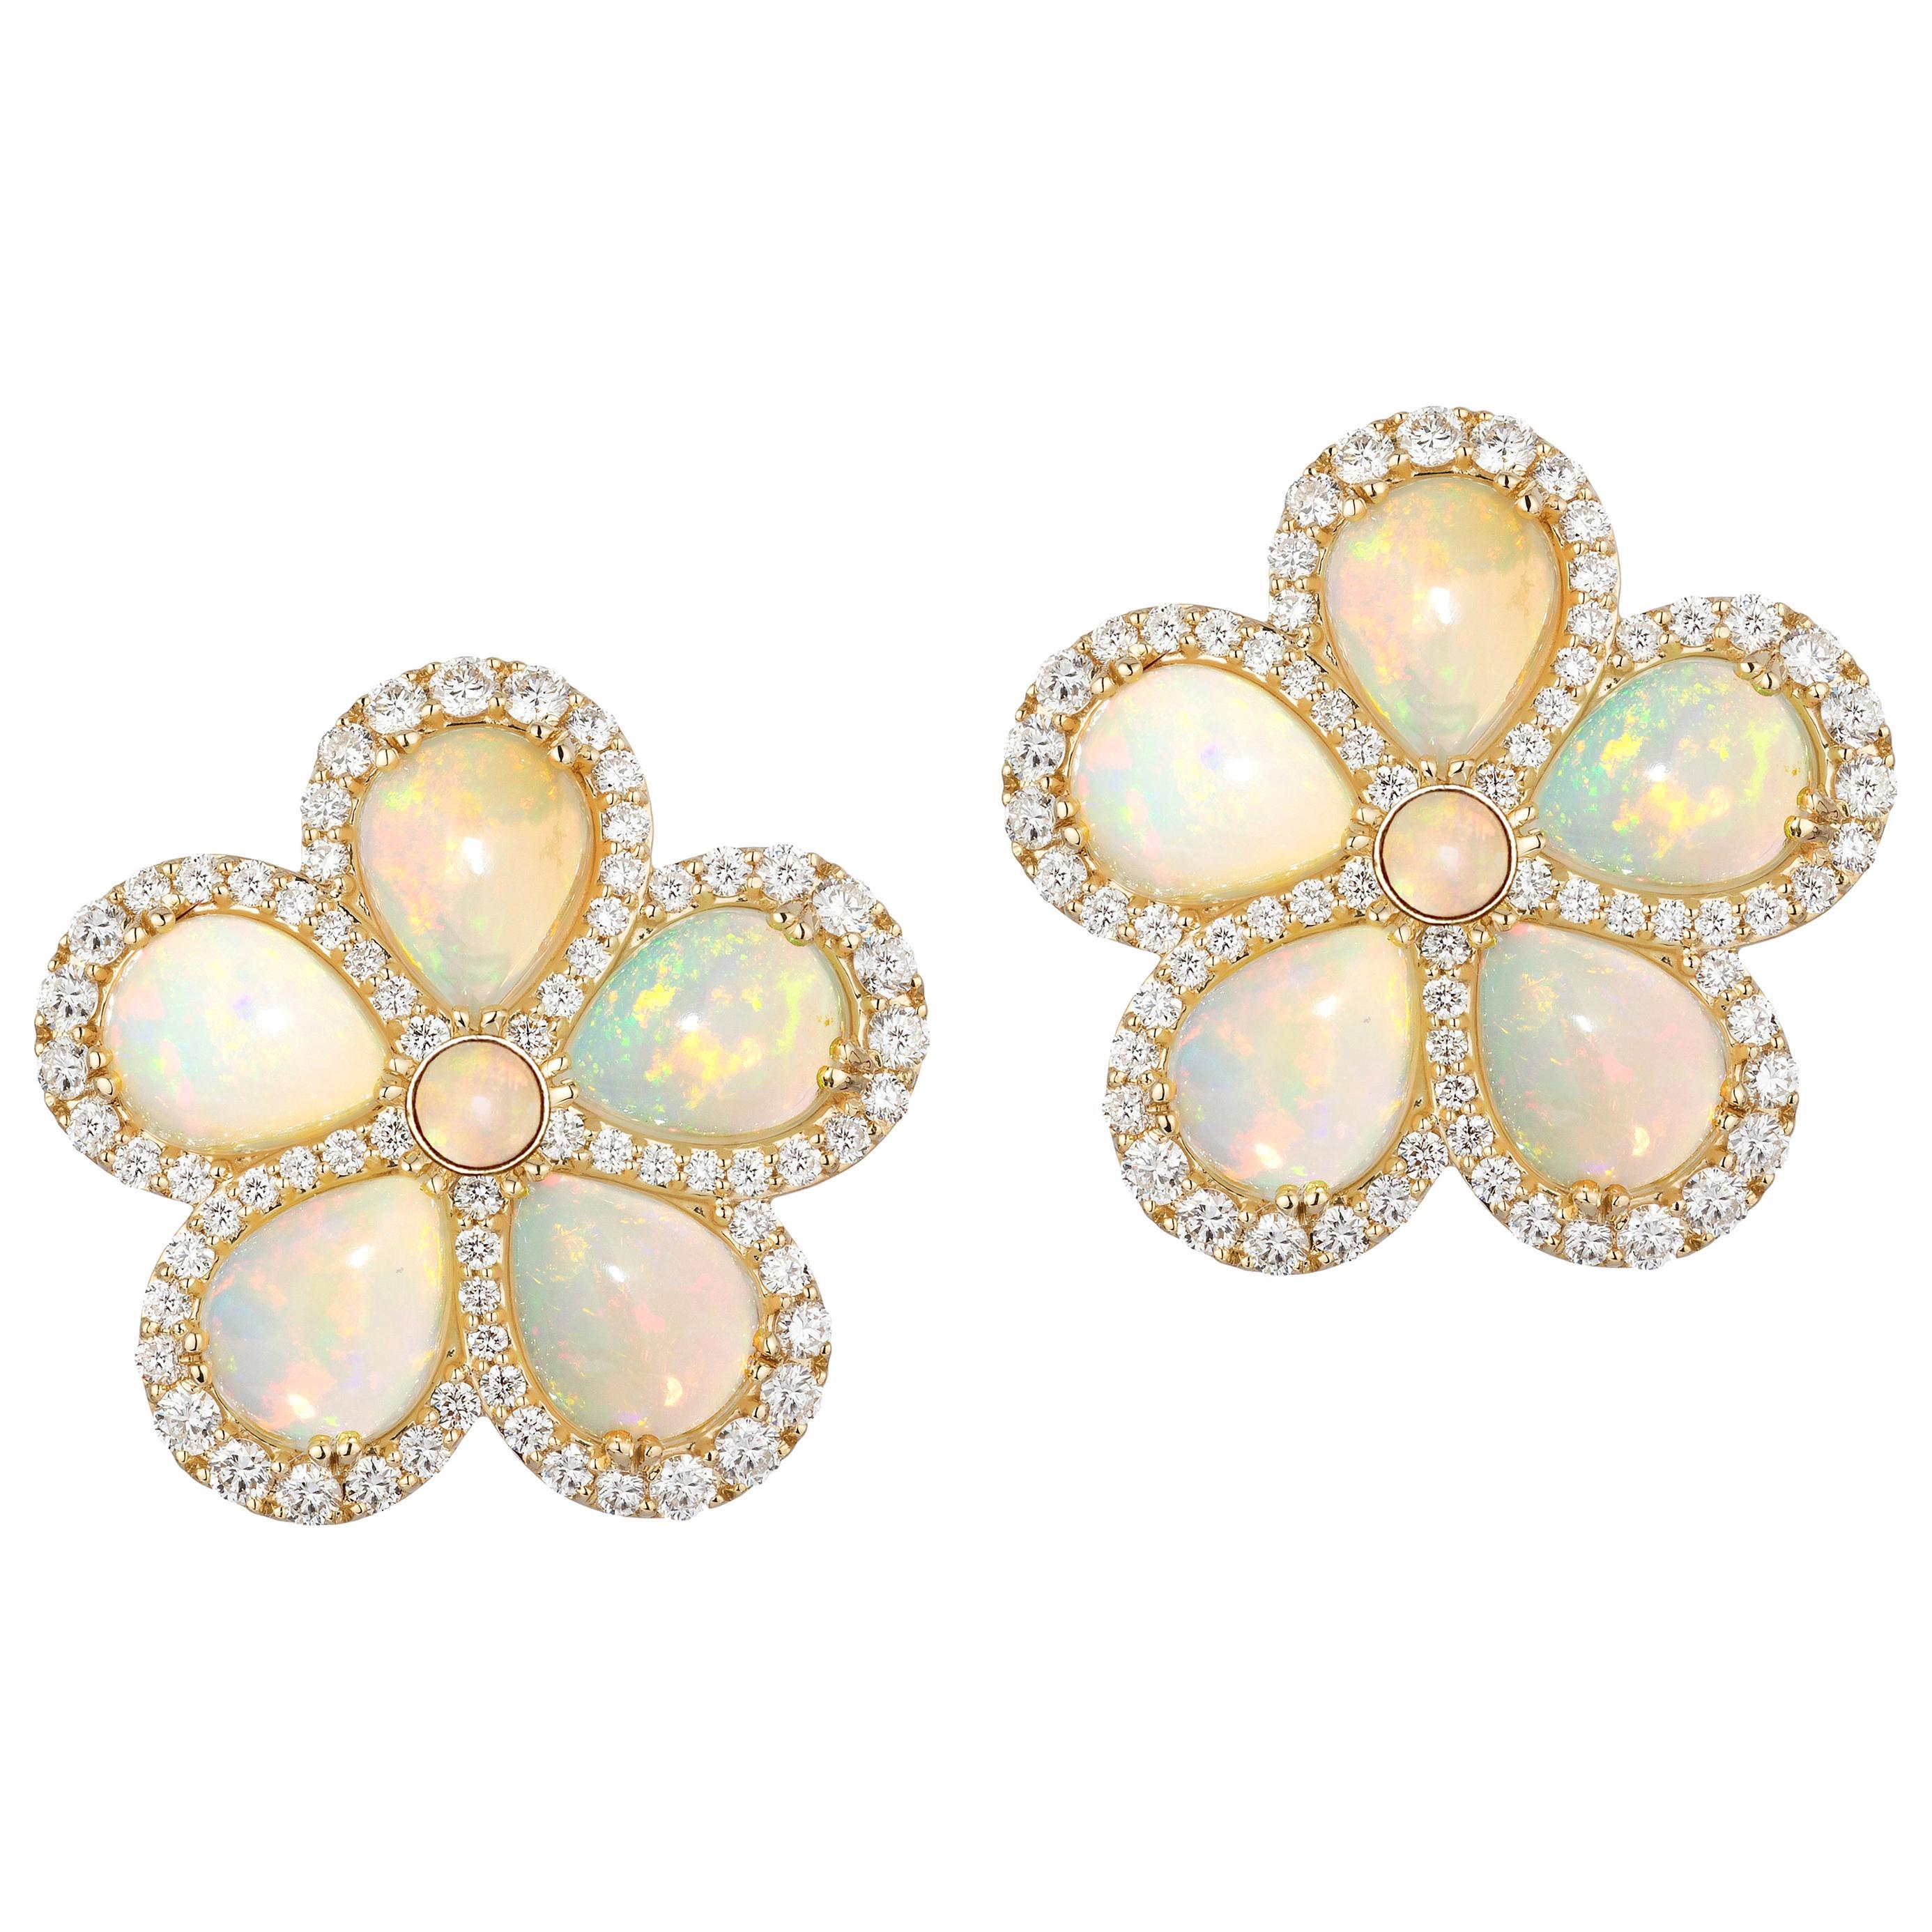 Goshwara More Earrings